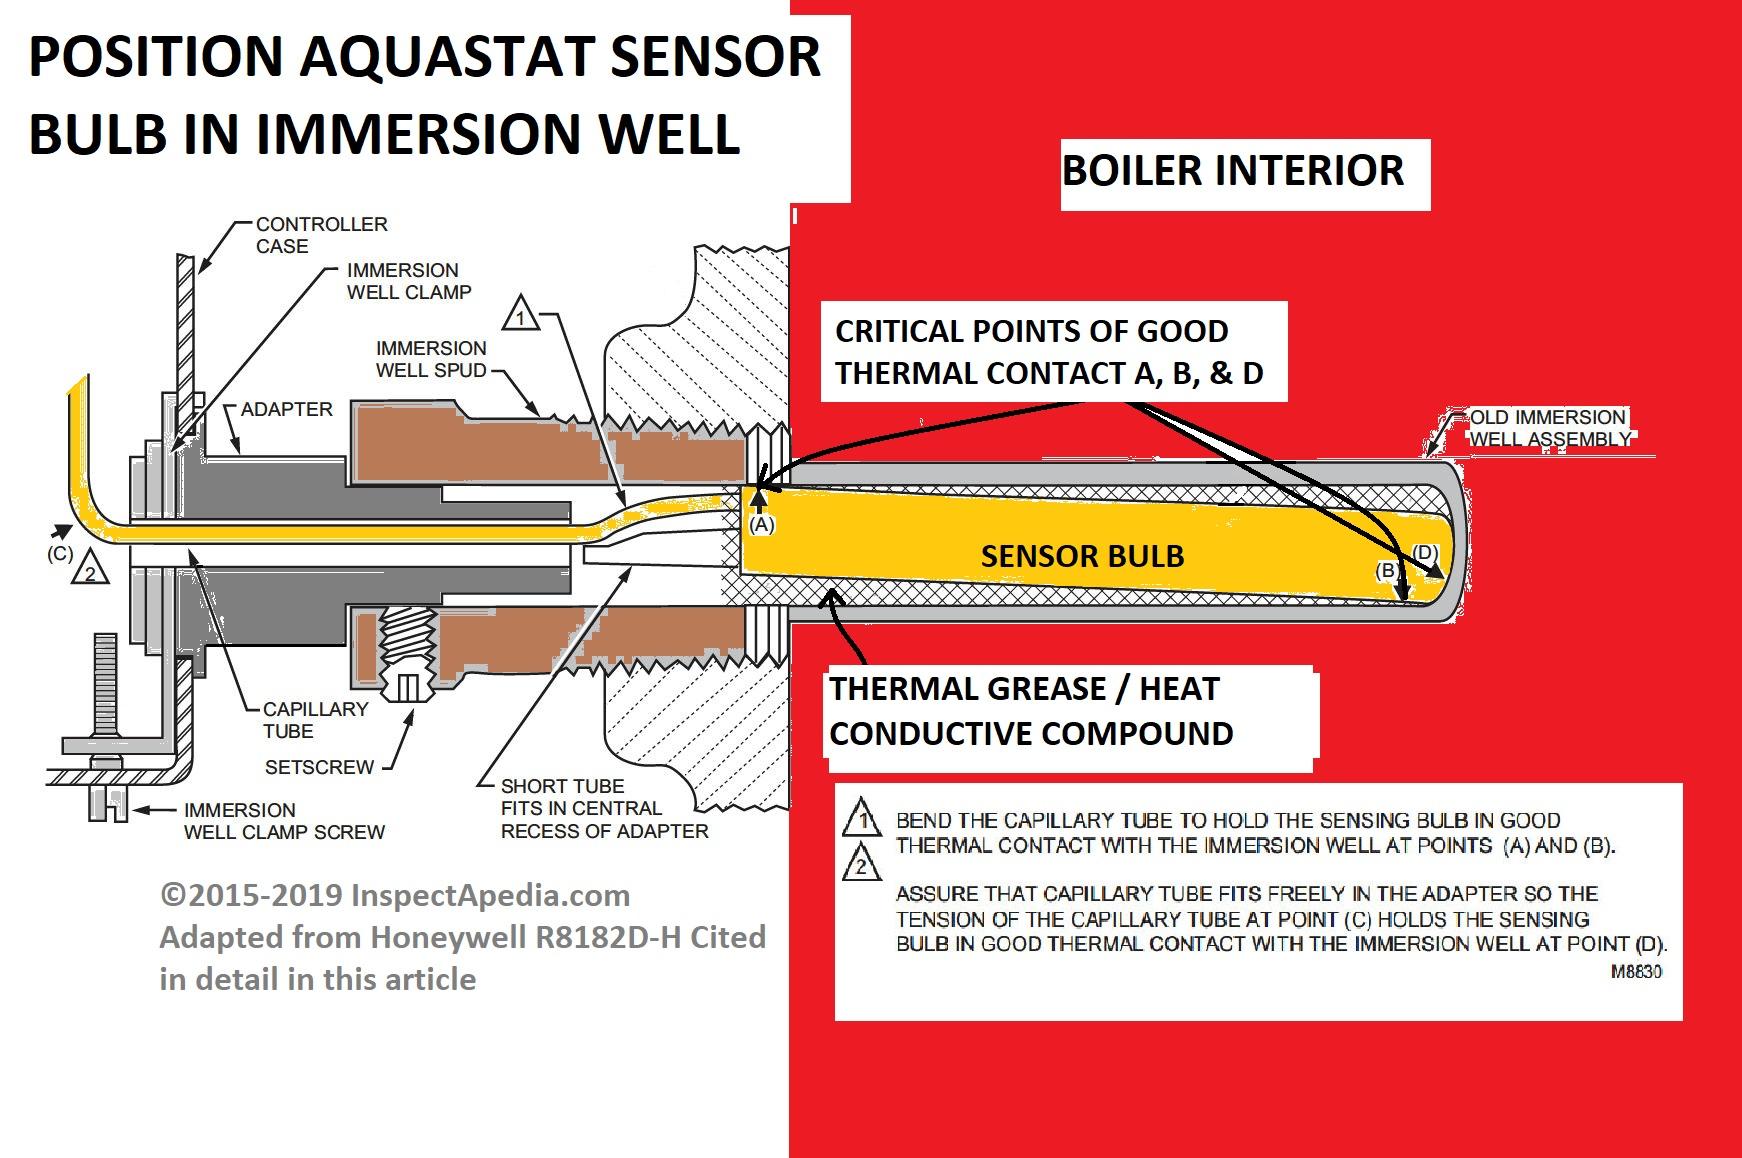 hight resolution of aquastat immersion well sensor details adapted from honeywell s l7224u universal aquastat installation instructions cited in